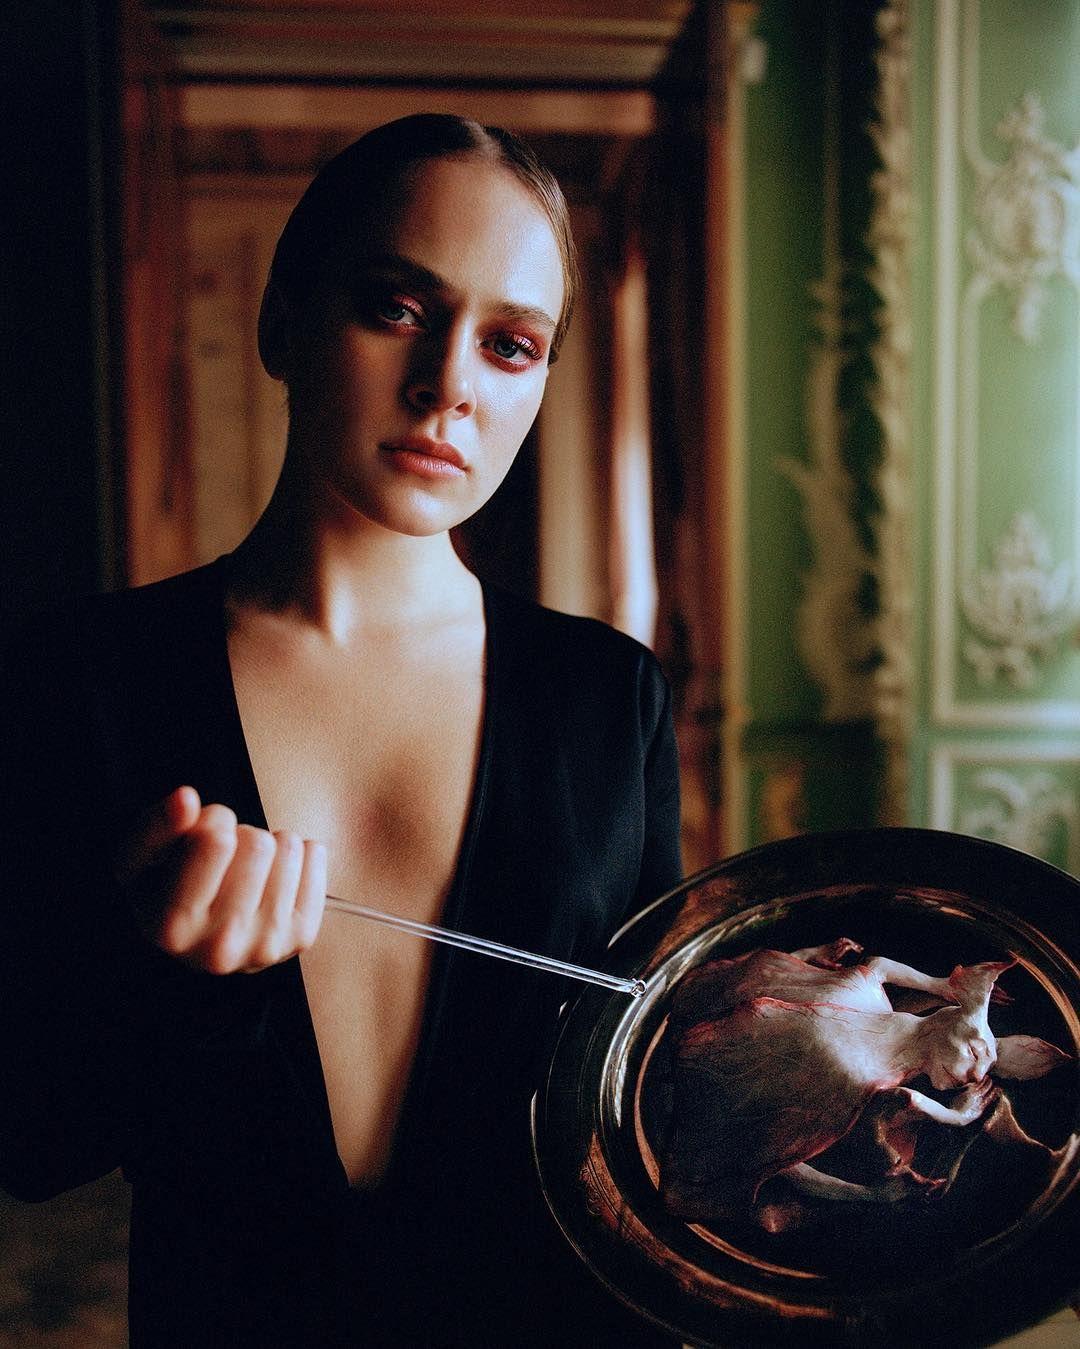 Аглая Тарасова фото плейбой